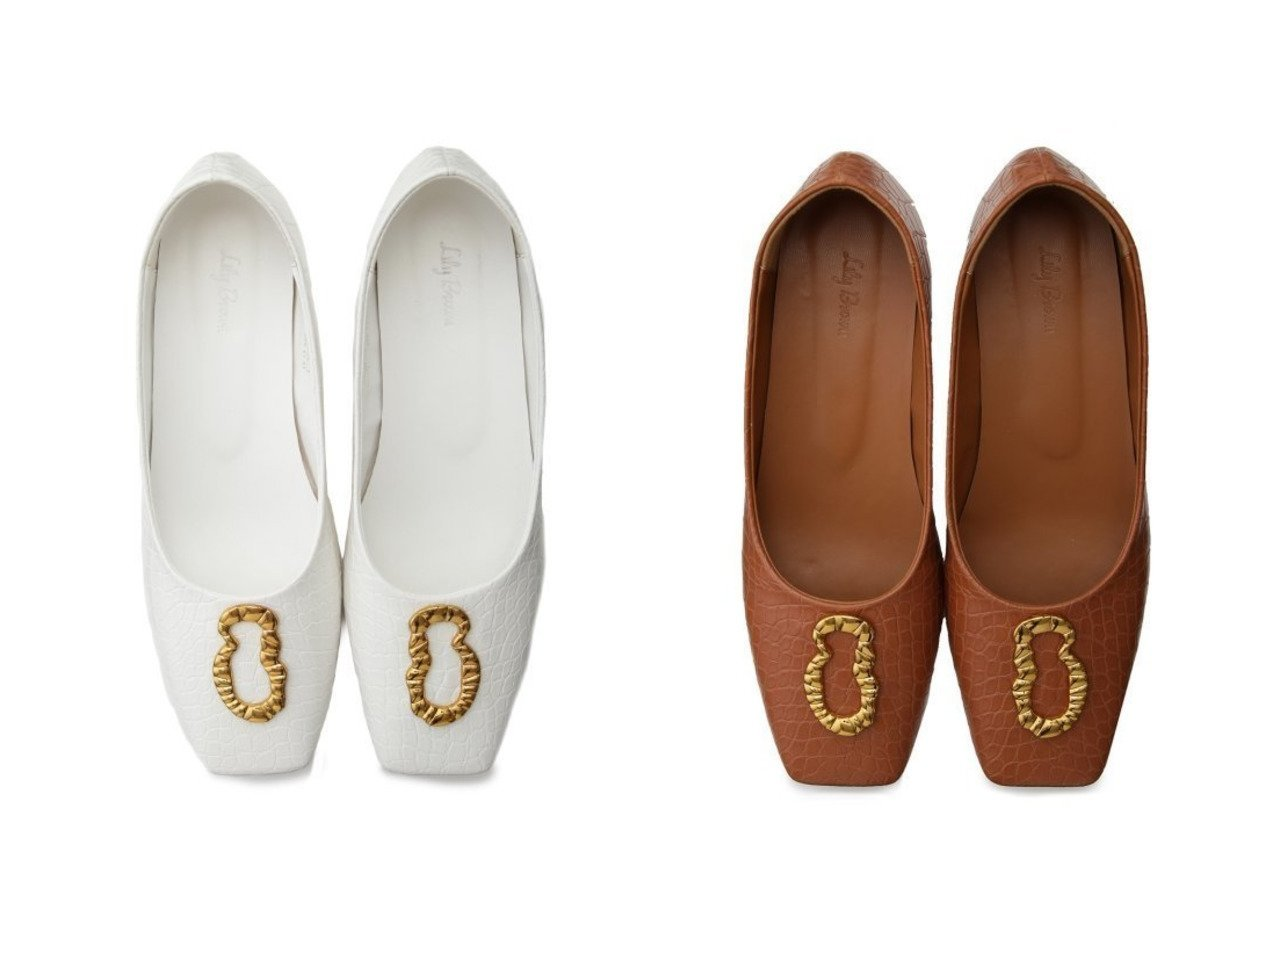 【Lily Brown/リリーブラウン】のモチーフフラットシューズ リリーブラウンのおすすめ!人気、トレンド・レディースファッションの通販 おすすめで人気の流行・トレンド、ファッションの通販商品 メンズファッション・キッズファッション・インテリア・家具・レディースファッション・服の通販 founy(ファニー) https://founy.com/ ファッション Fashion レディースファッション WOMEN アンティーク シューズ スマート フェイクレザー フラット ベーシック ボトム モチーフ ヴィンテージ 再入荷 Restock/Back in Stock/Re Arrival |ID:crp329100000022016